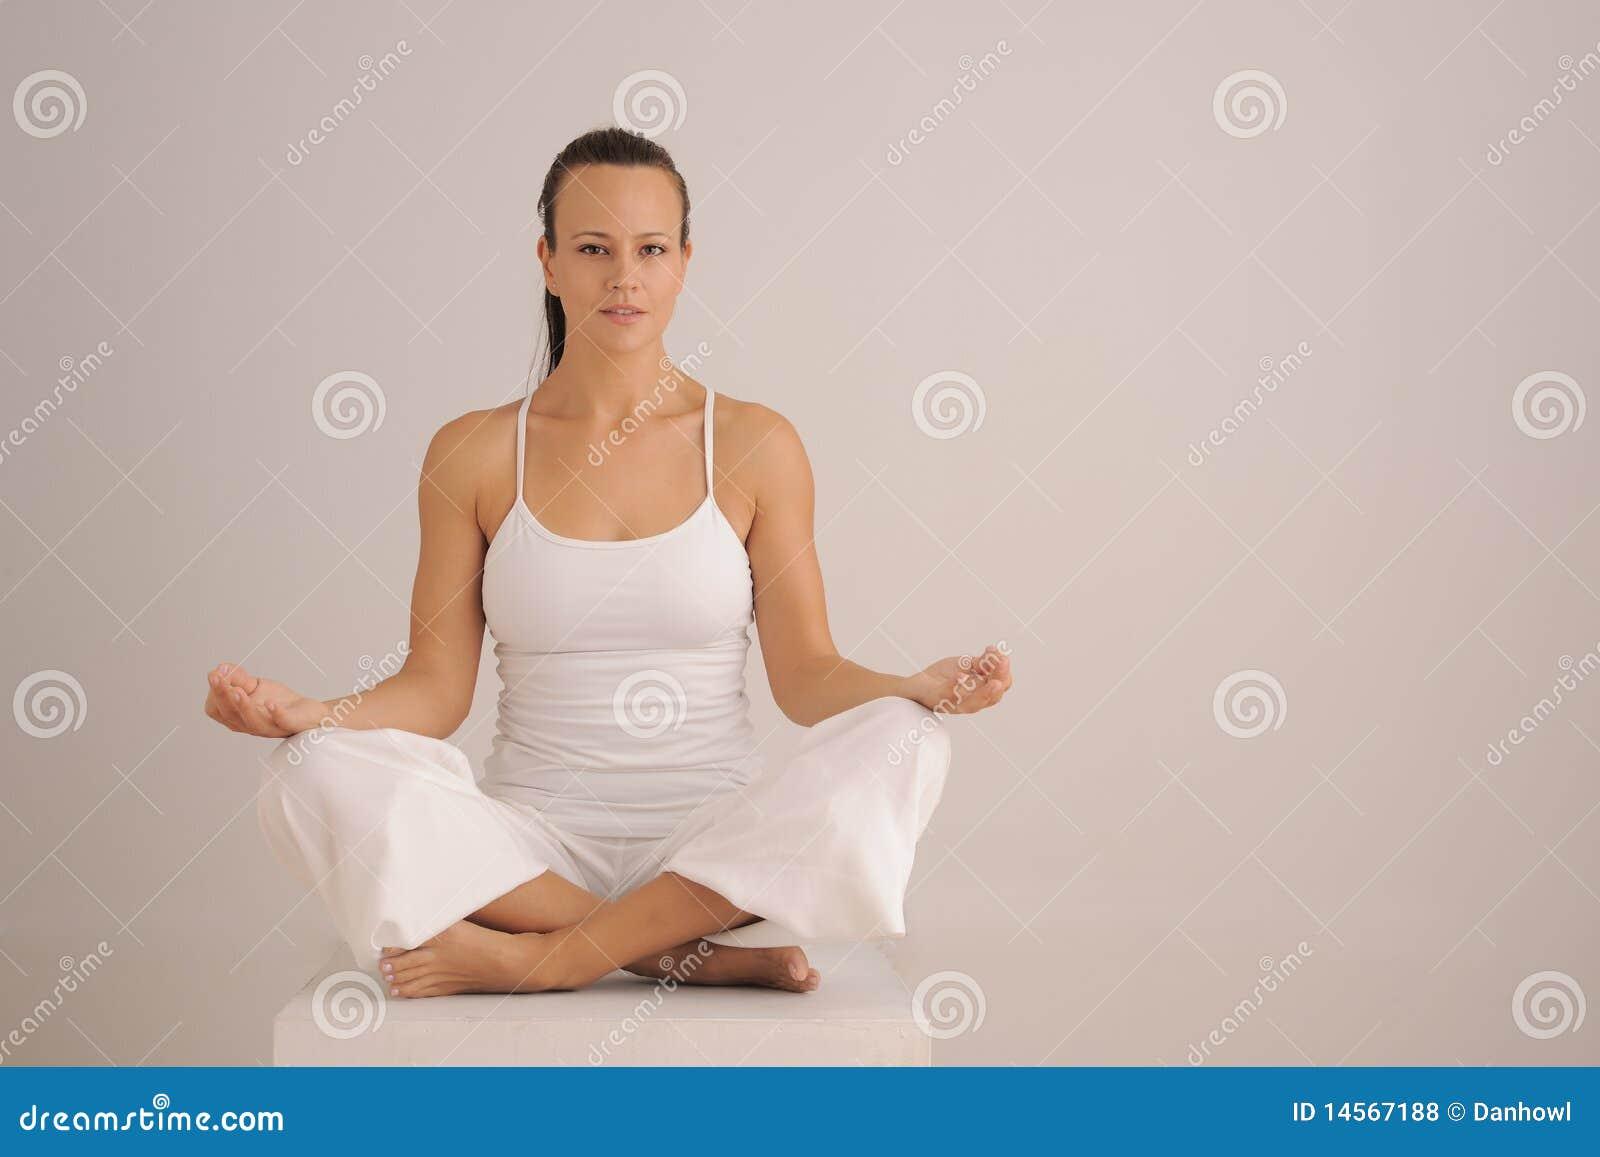 Royalty Free Stock Photos  Yoga Meditation PoseYoga Meditation Pose